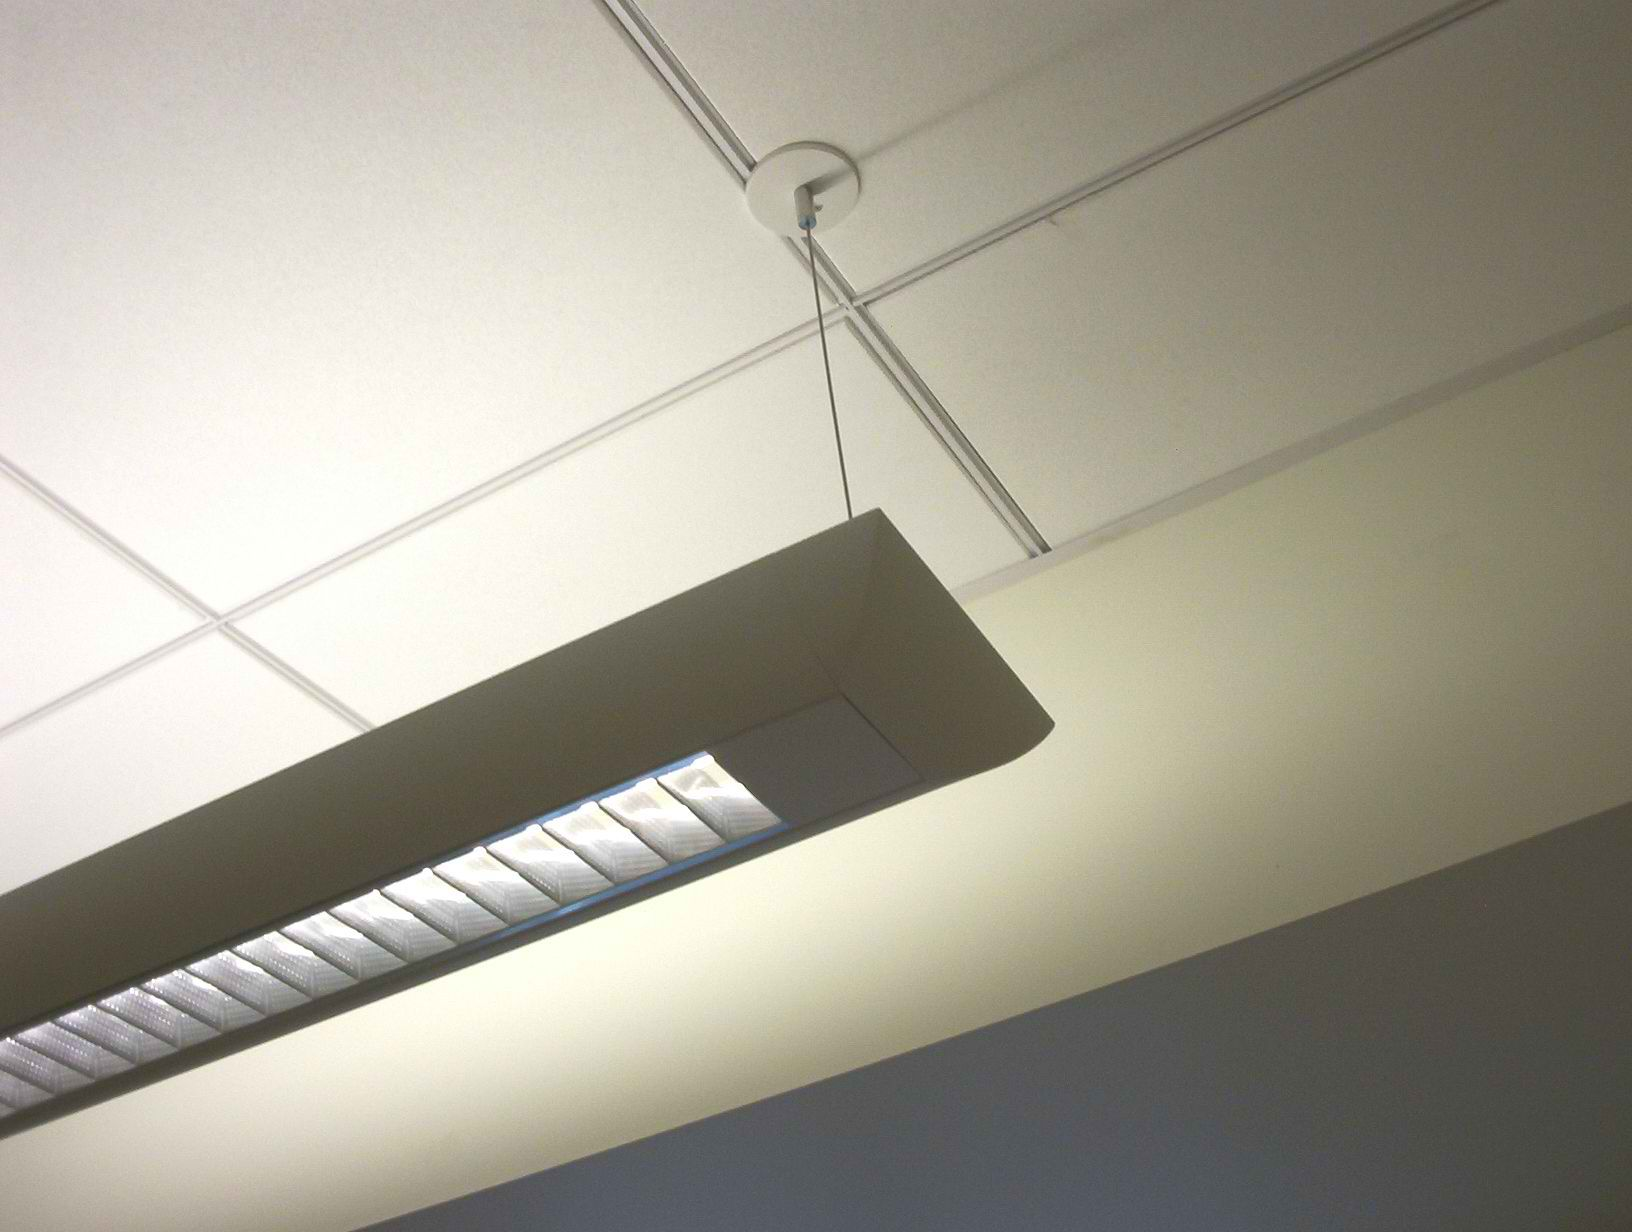 industrial kitchen light fixtures kitchen style indirect fluorescent light fixtures